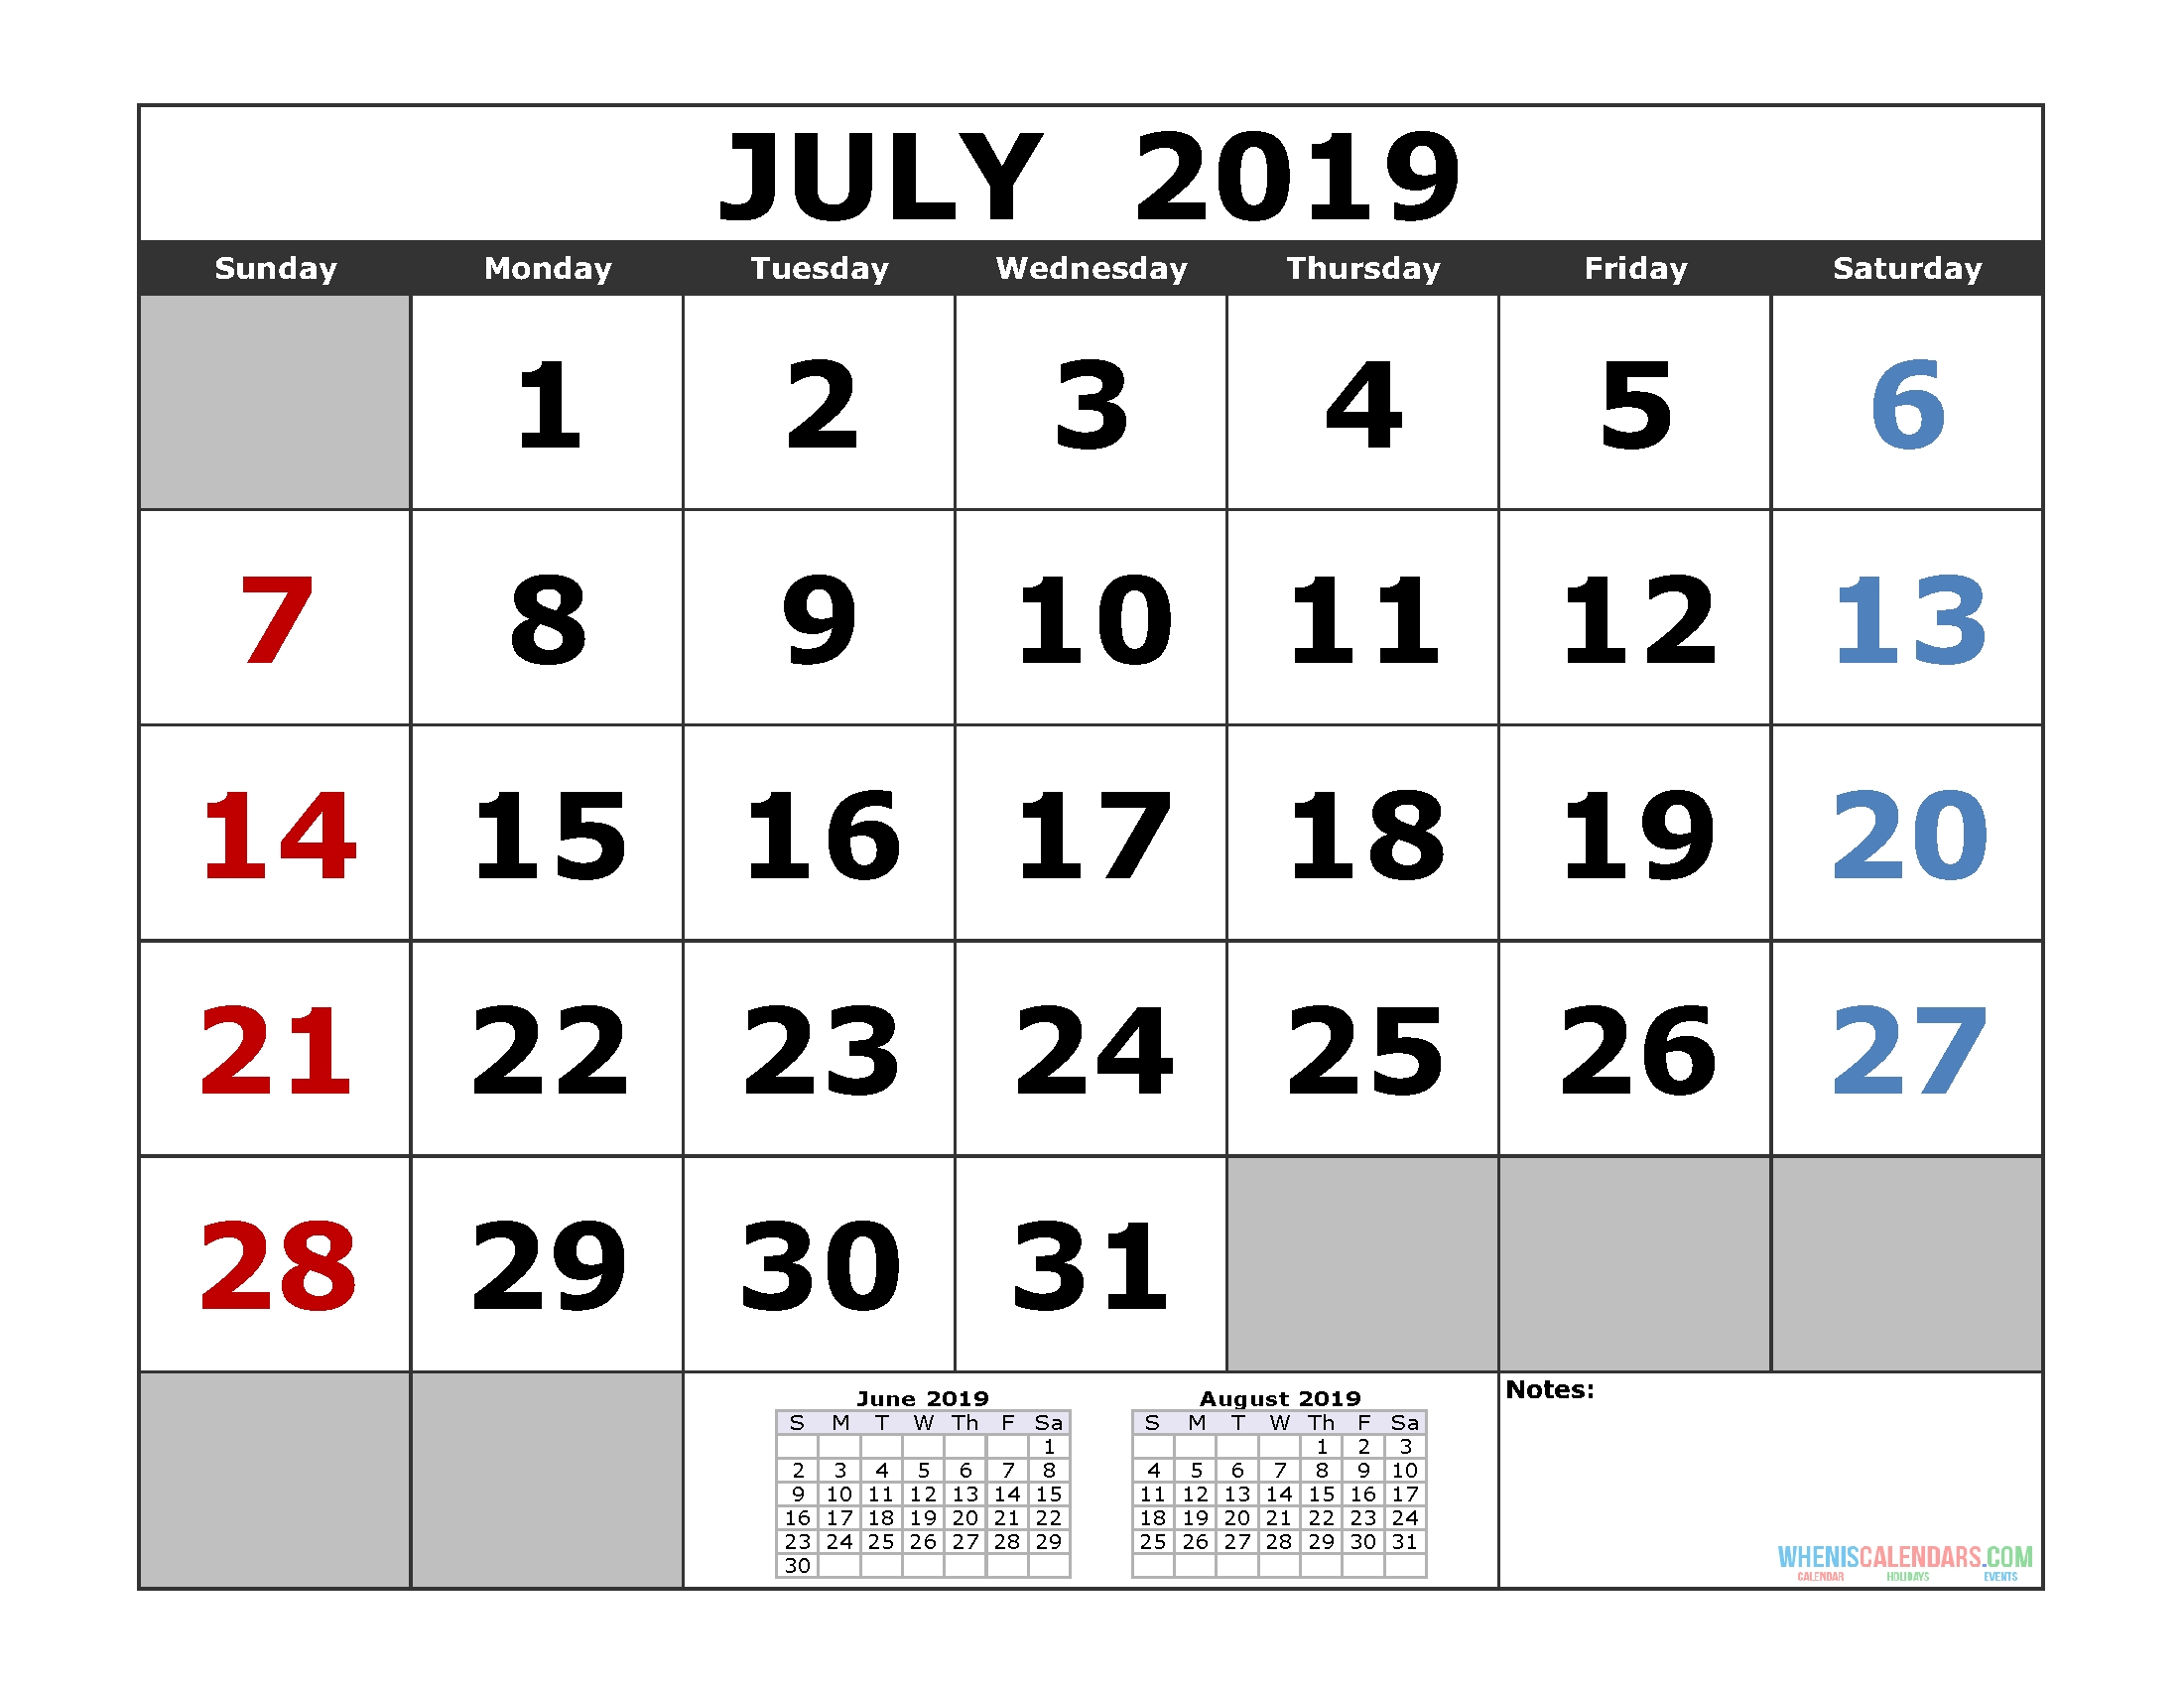 July 2019 Printable Calendar Template (3 Month Calendar)   Free regarding Caleners From July 2019 -December 2020 Free Printable